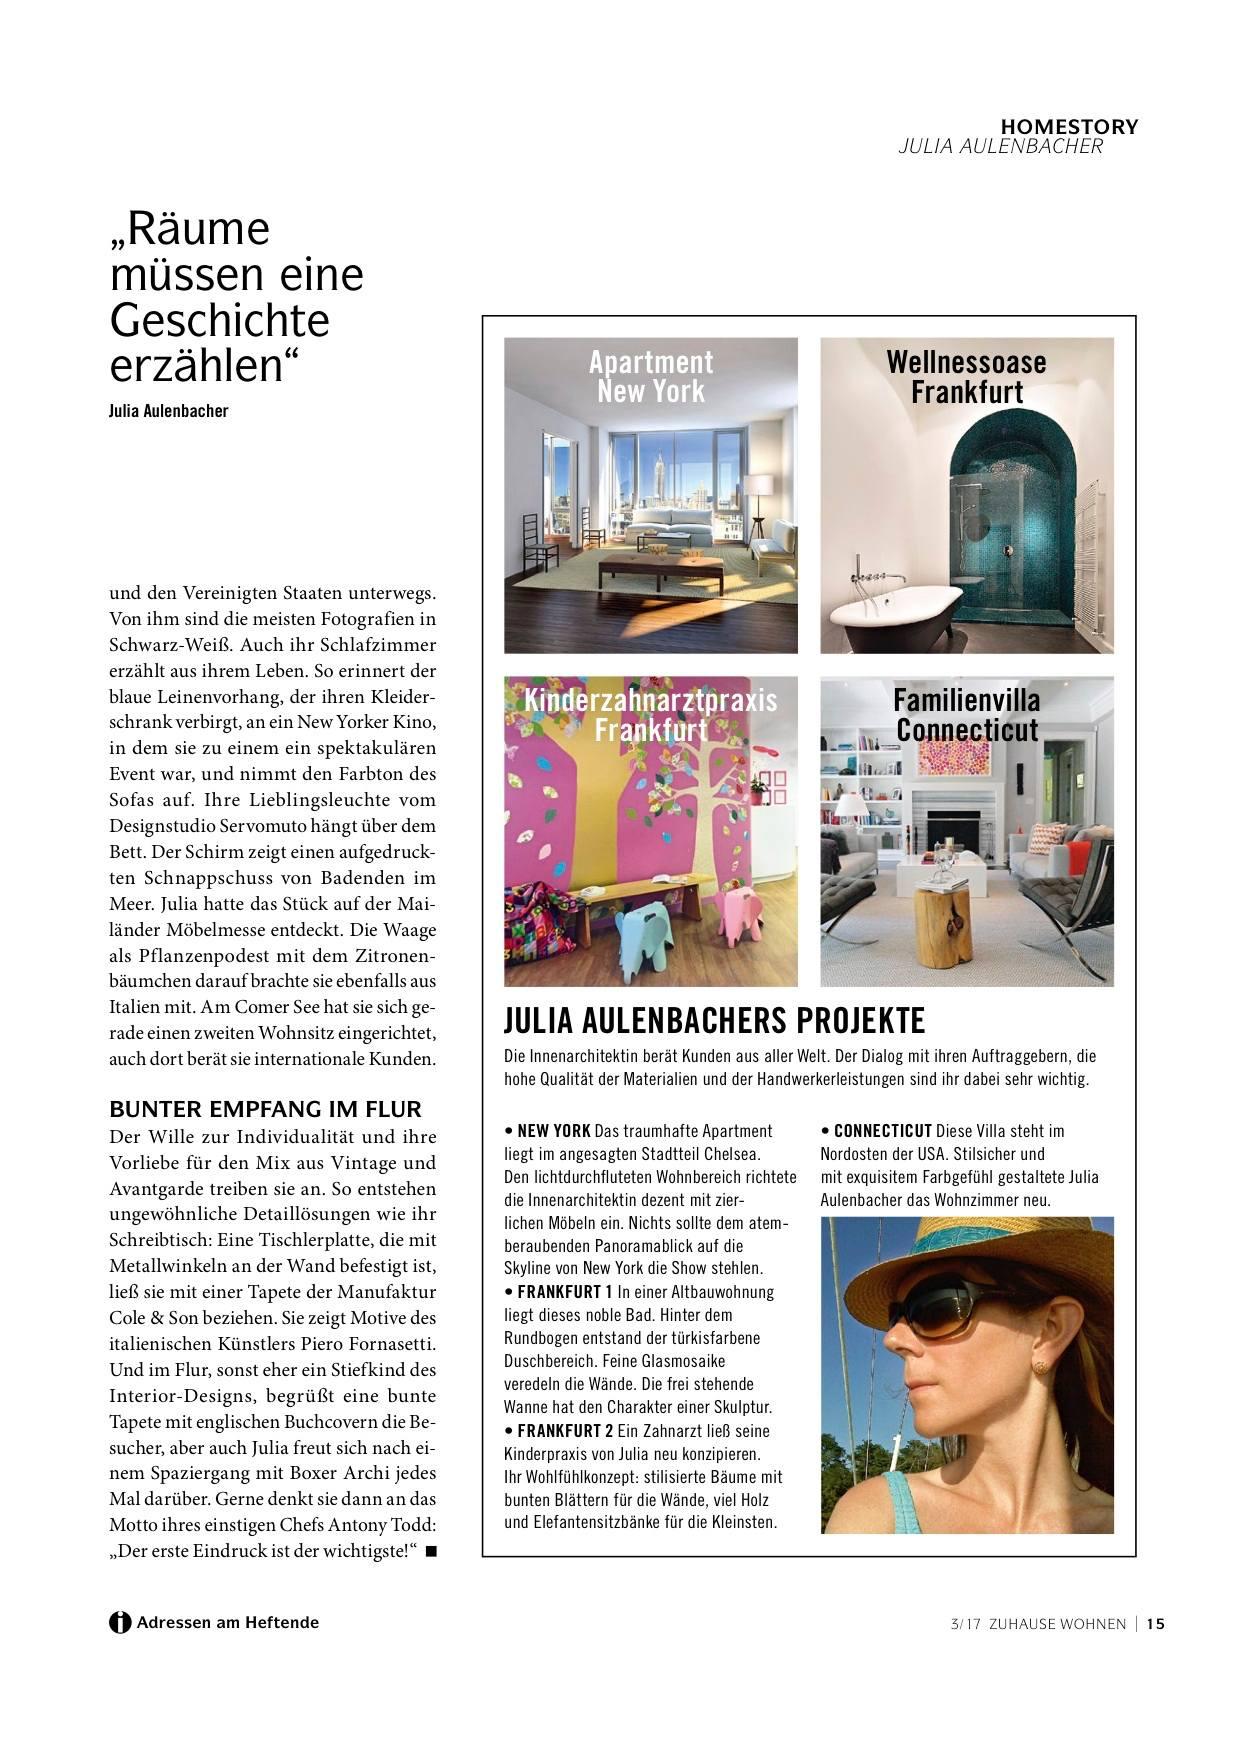 Julia Aulenbacher - Interiors +++ zu Hause wohnen 5